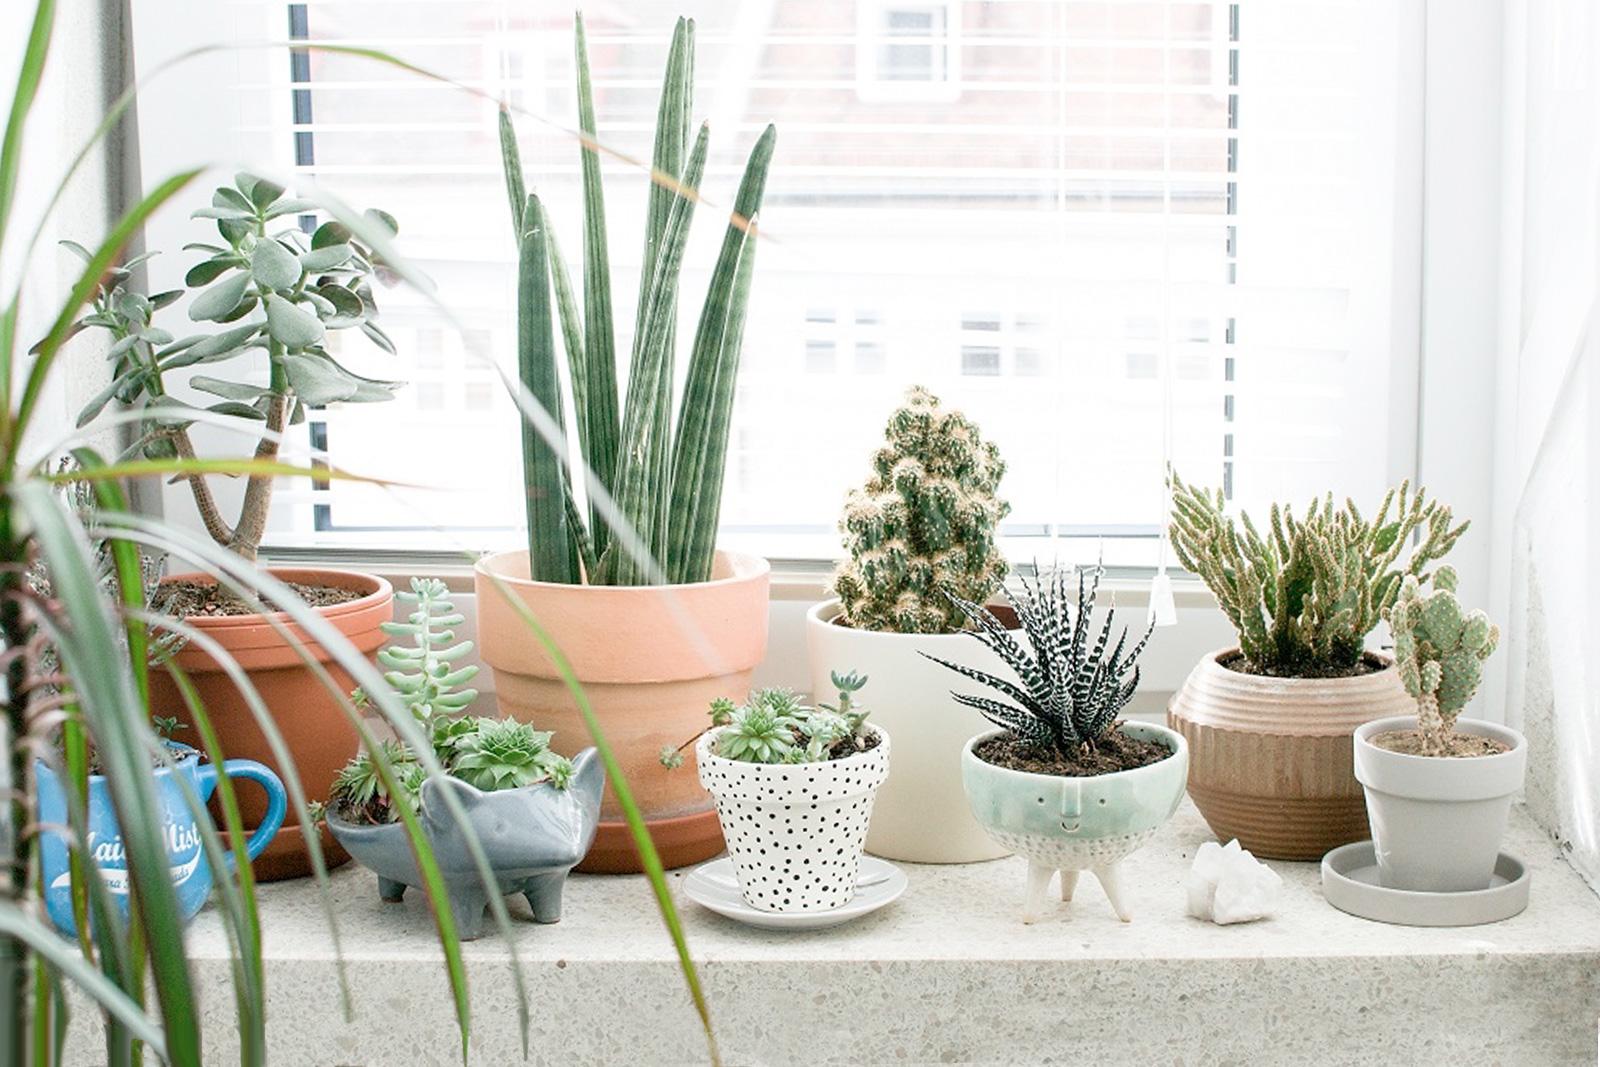 Plants on a home windowsill